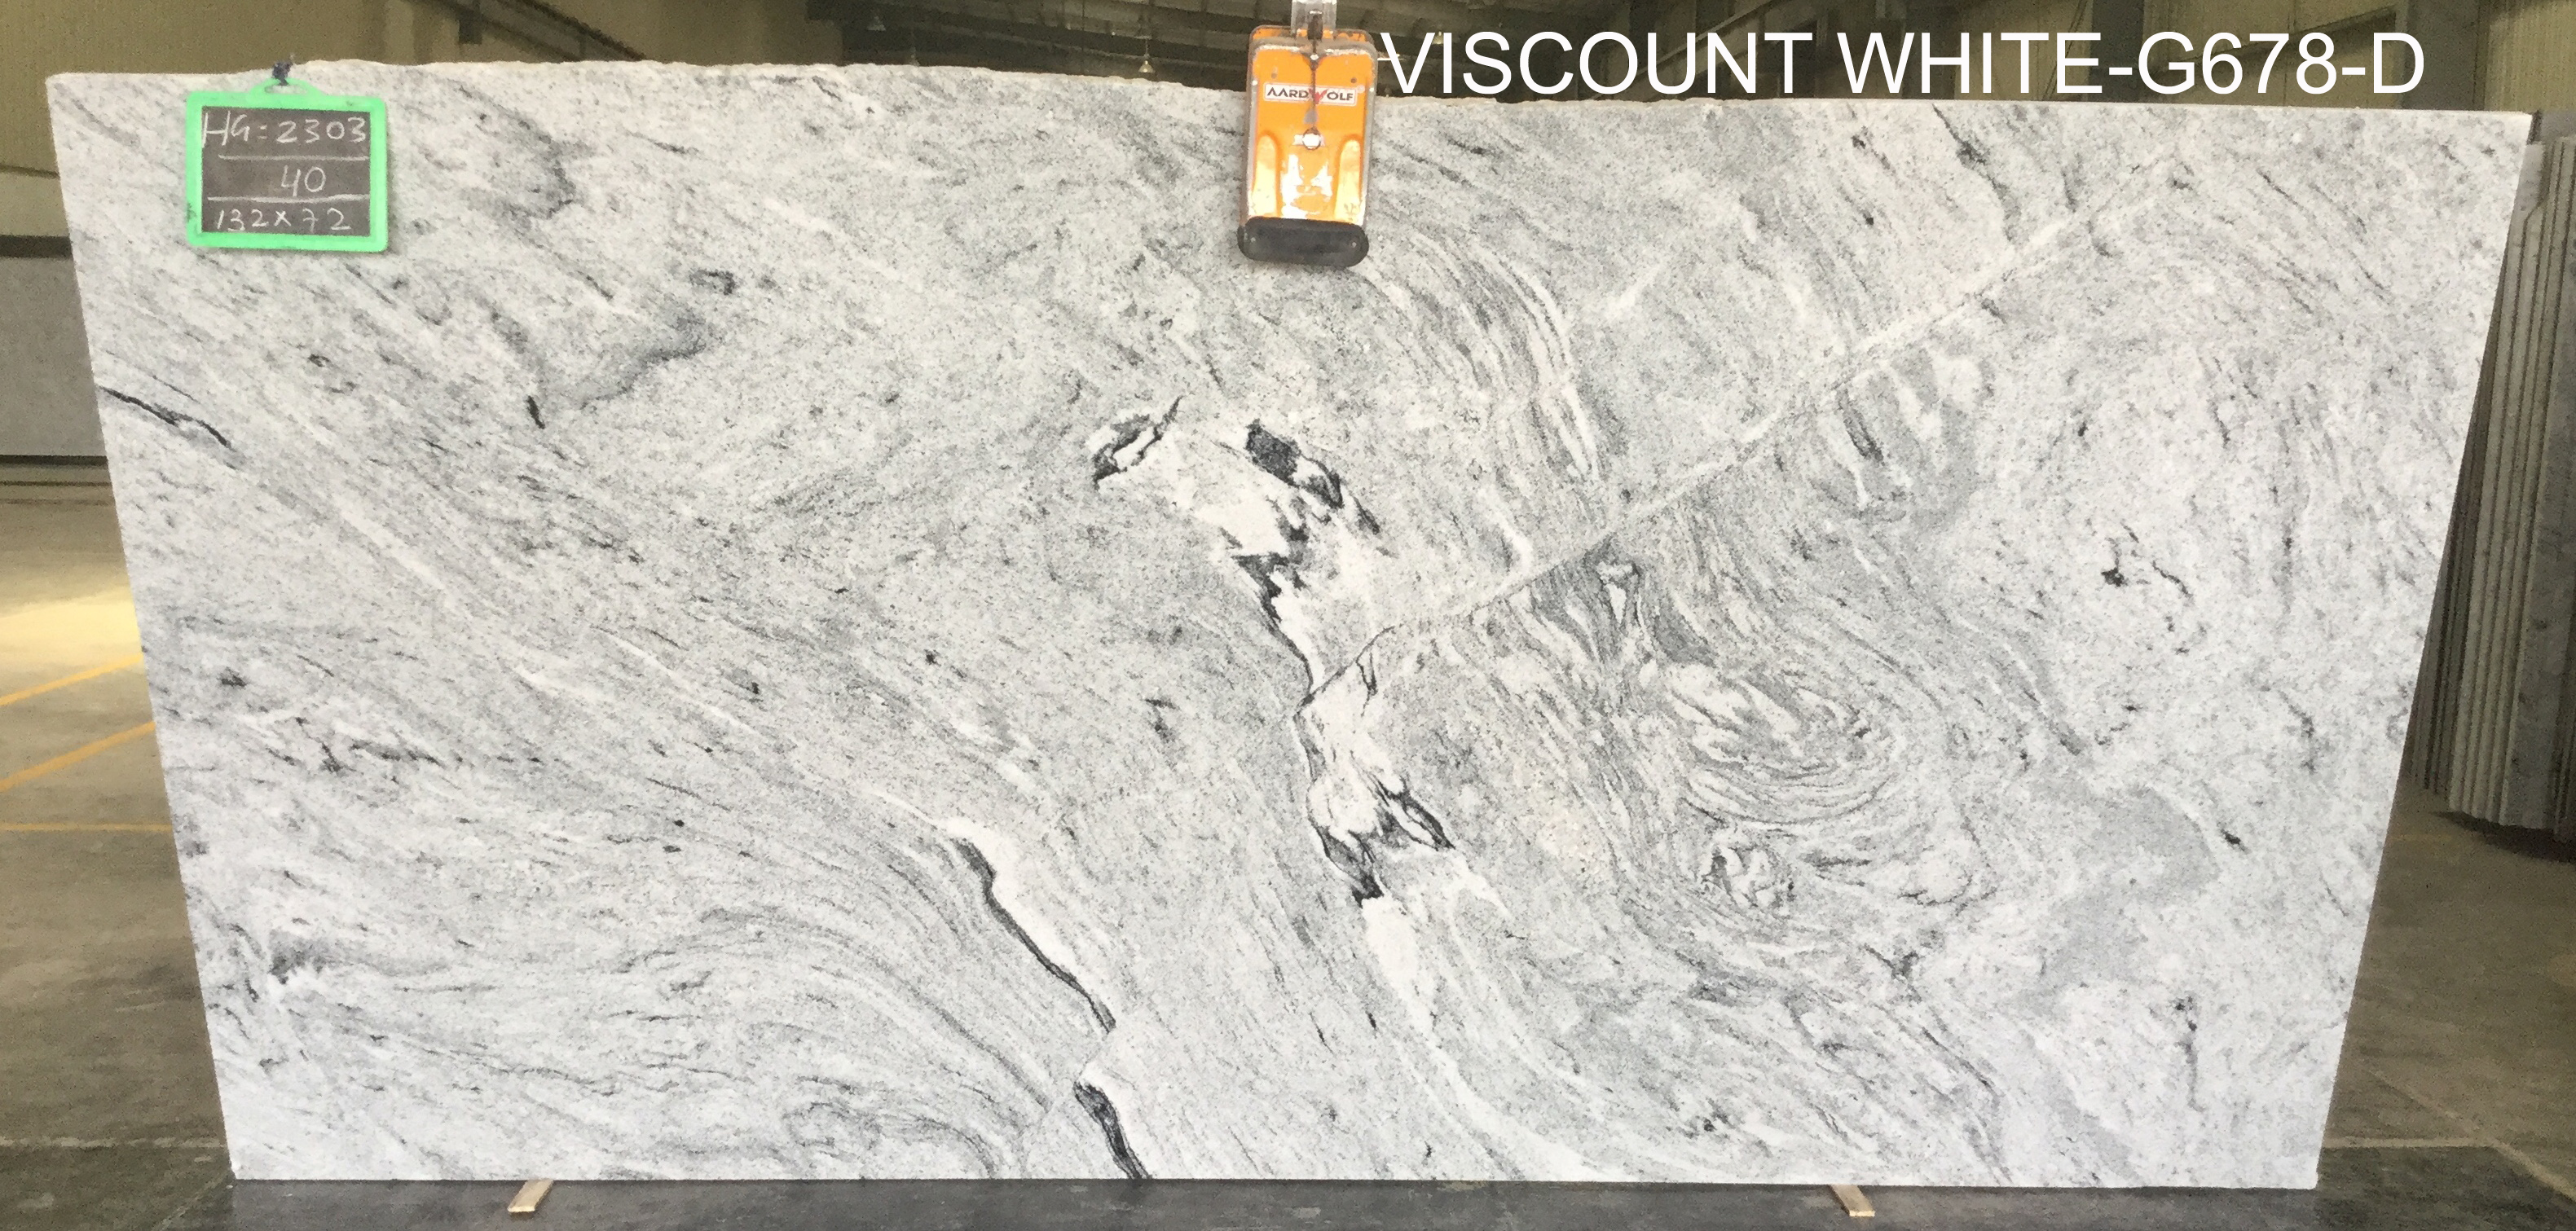 VISCOUNT WHITE